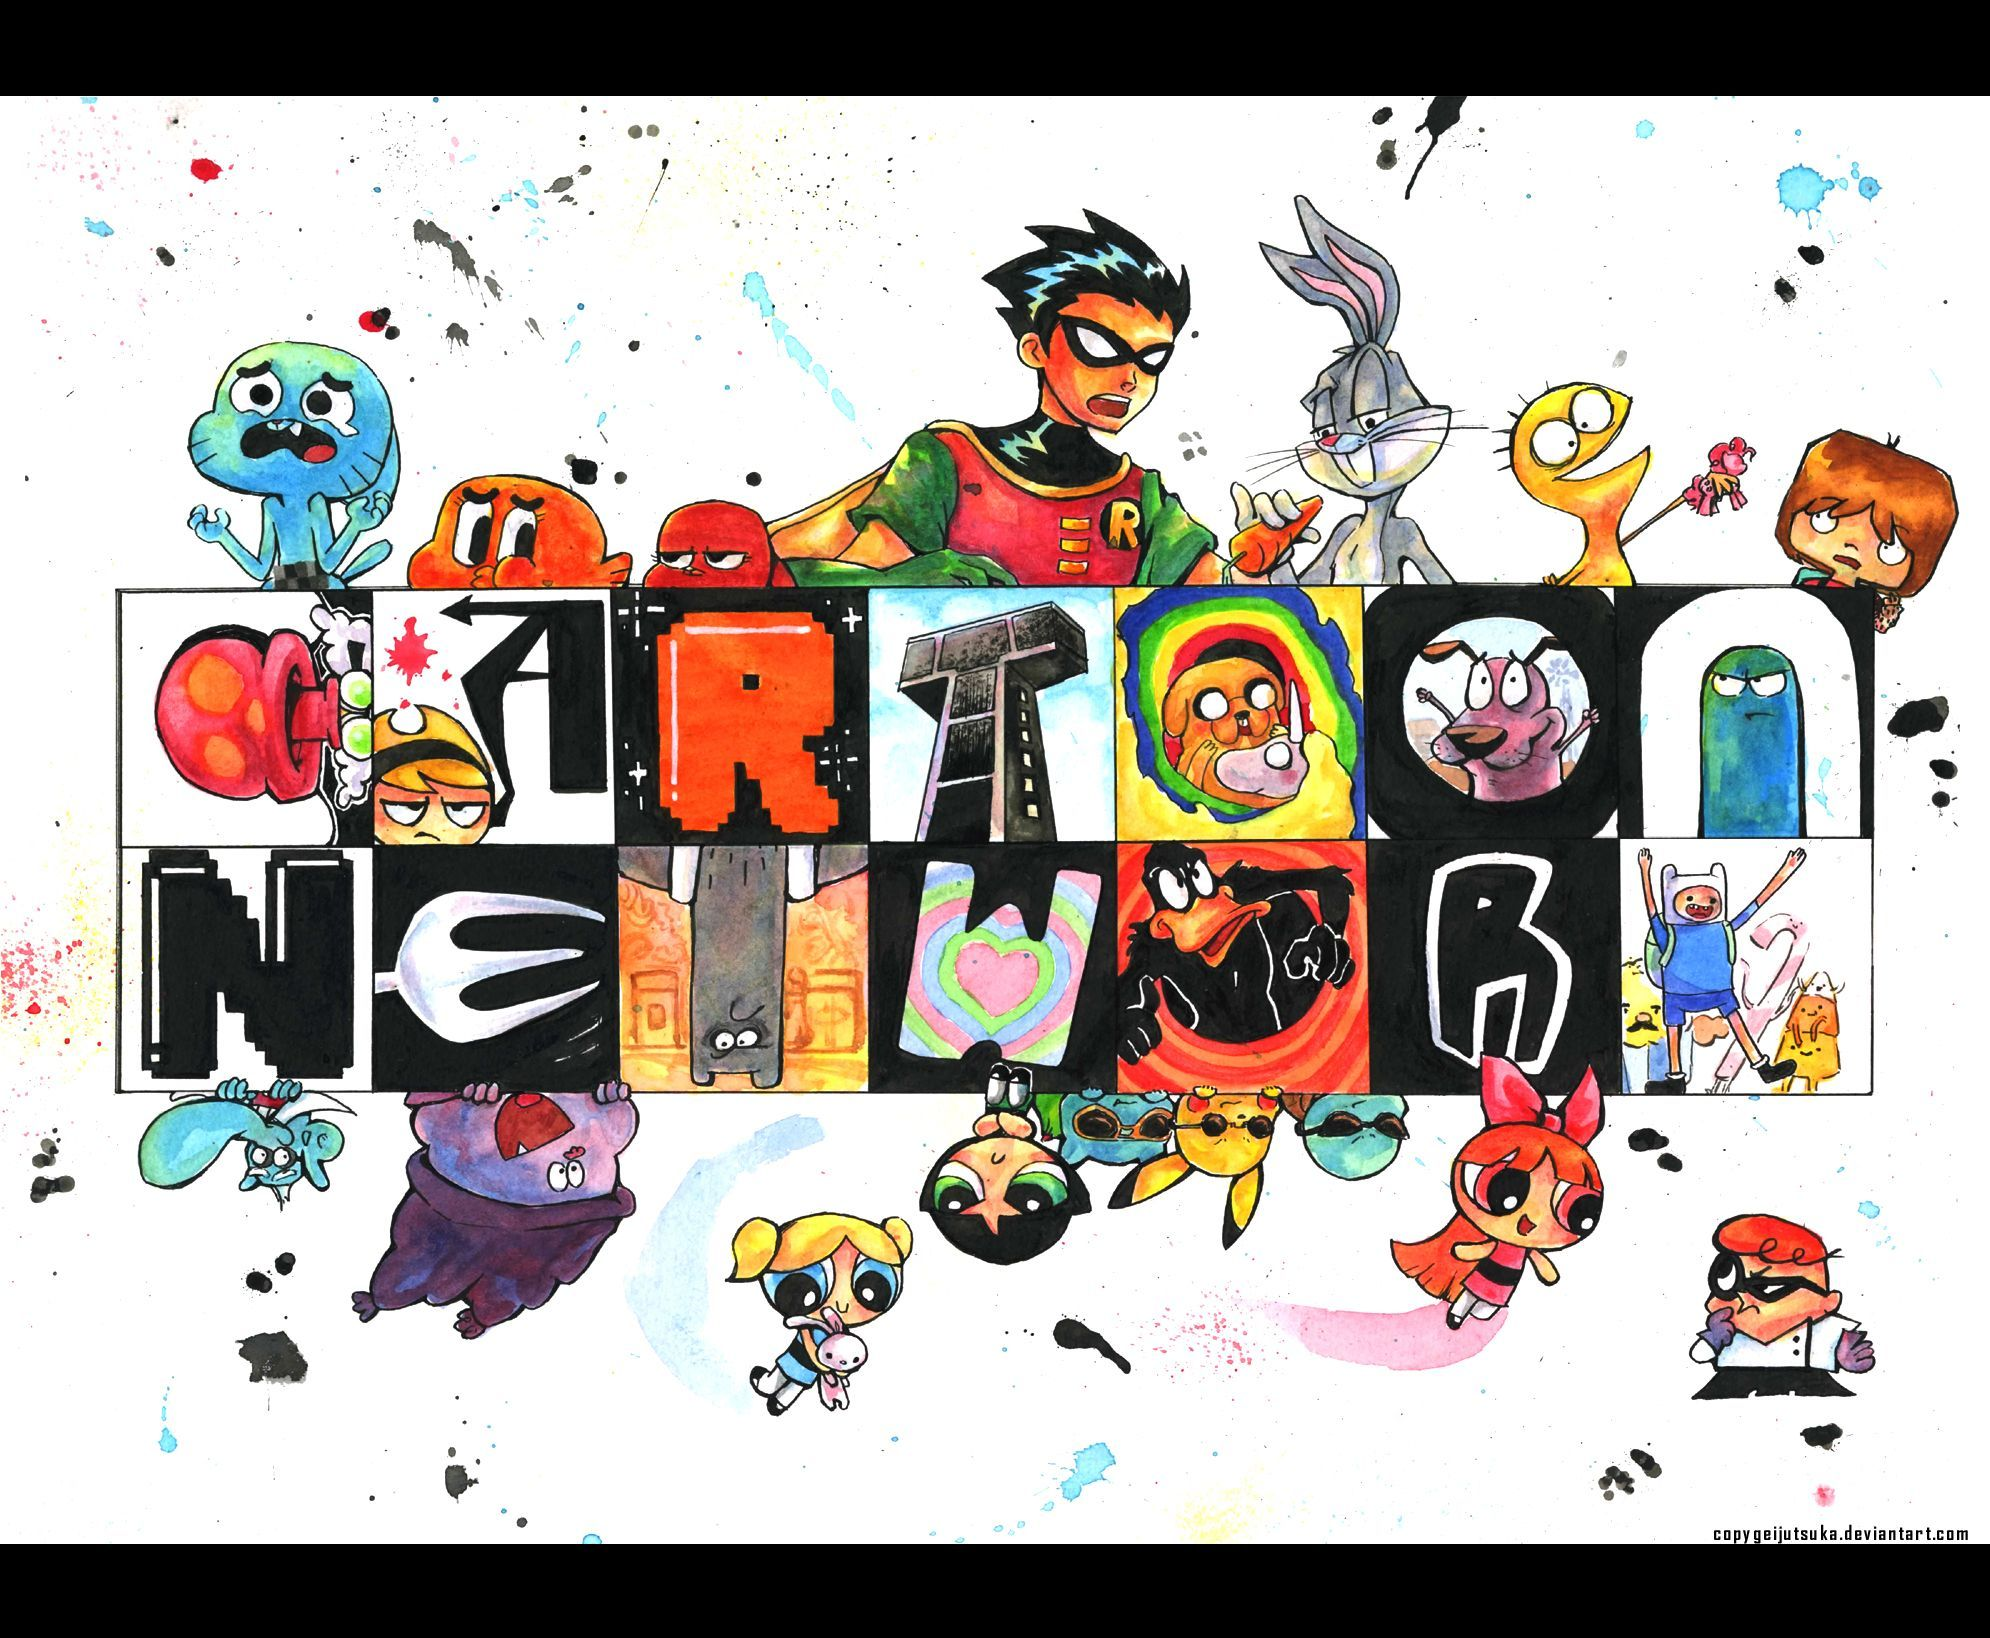 Cartoon Network Characters Wallpapers 1080p Cartoon Network Characters Cartoon Wallpaper Hd Character Wallpaper